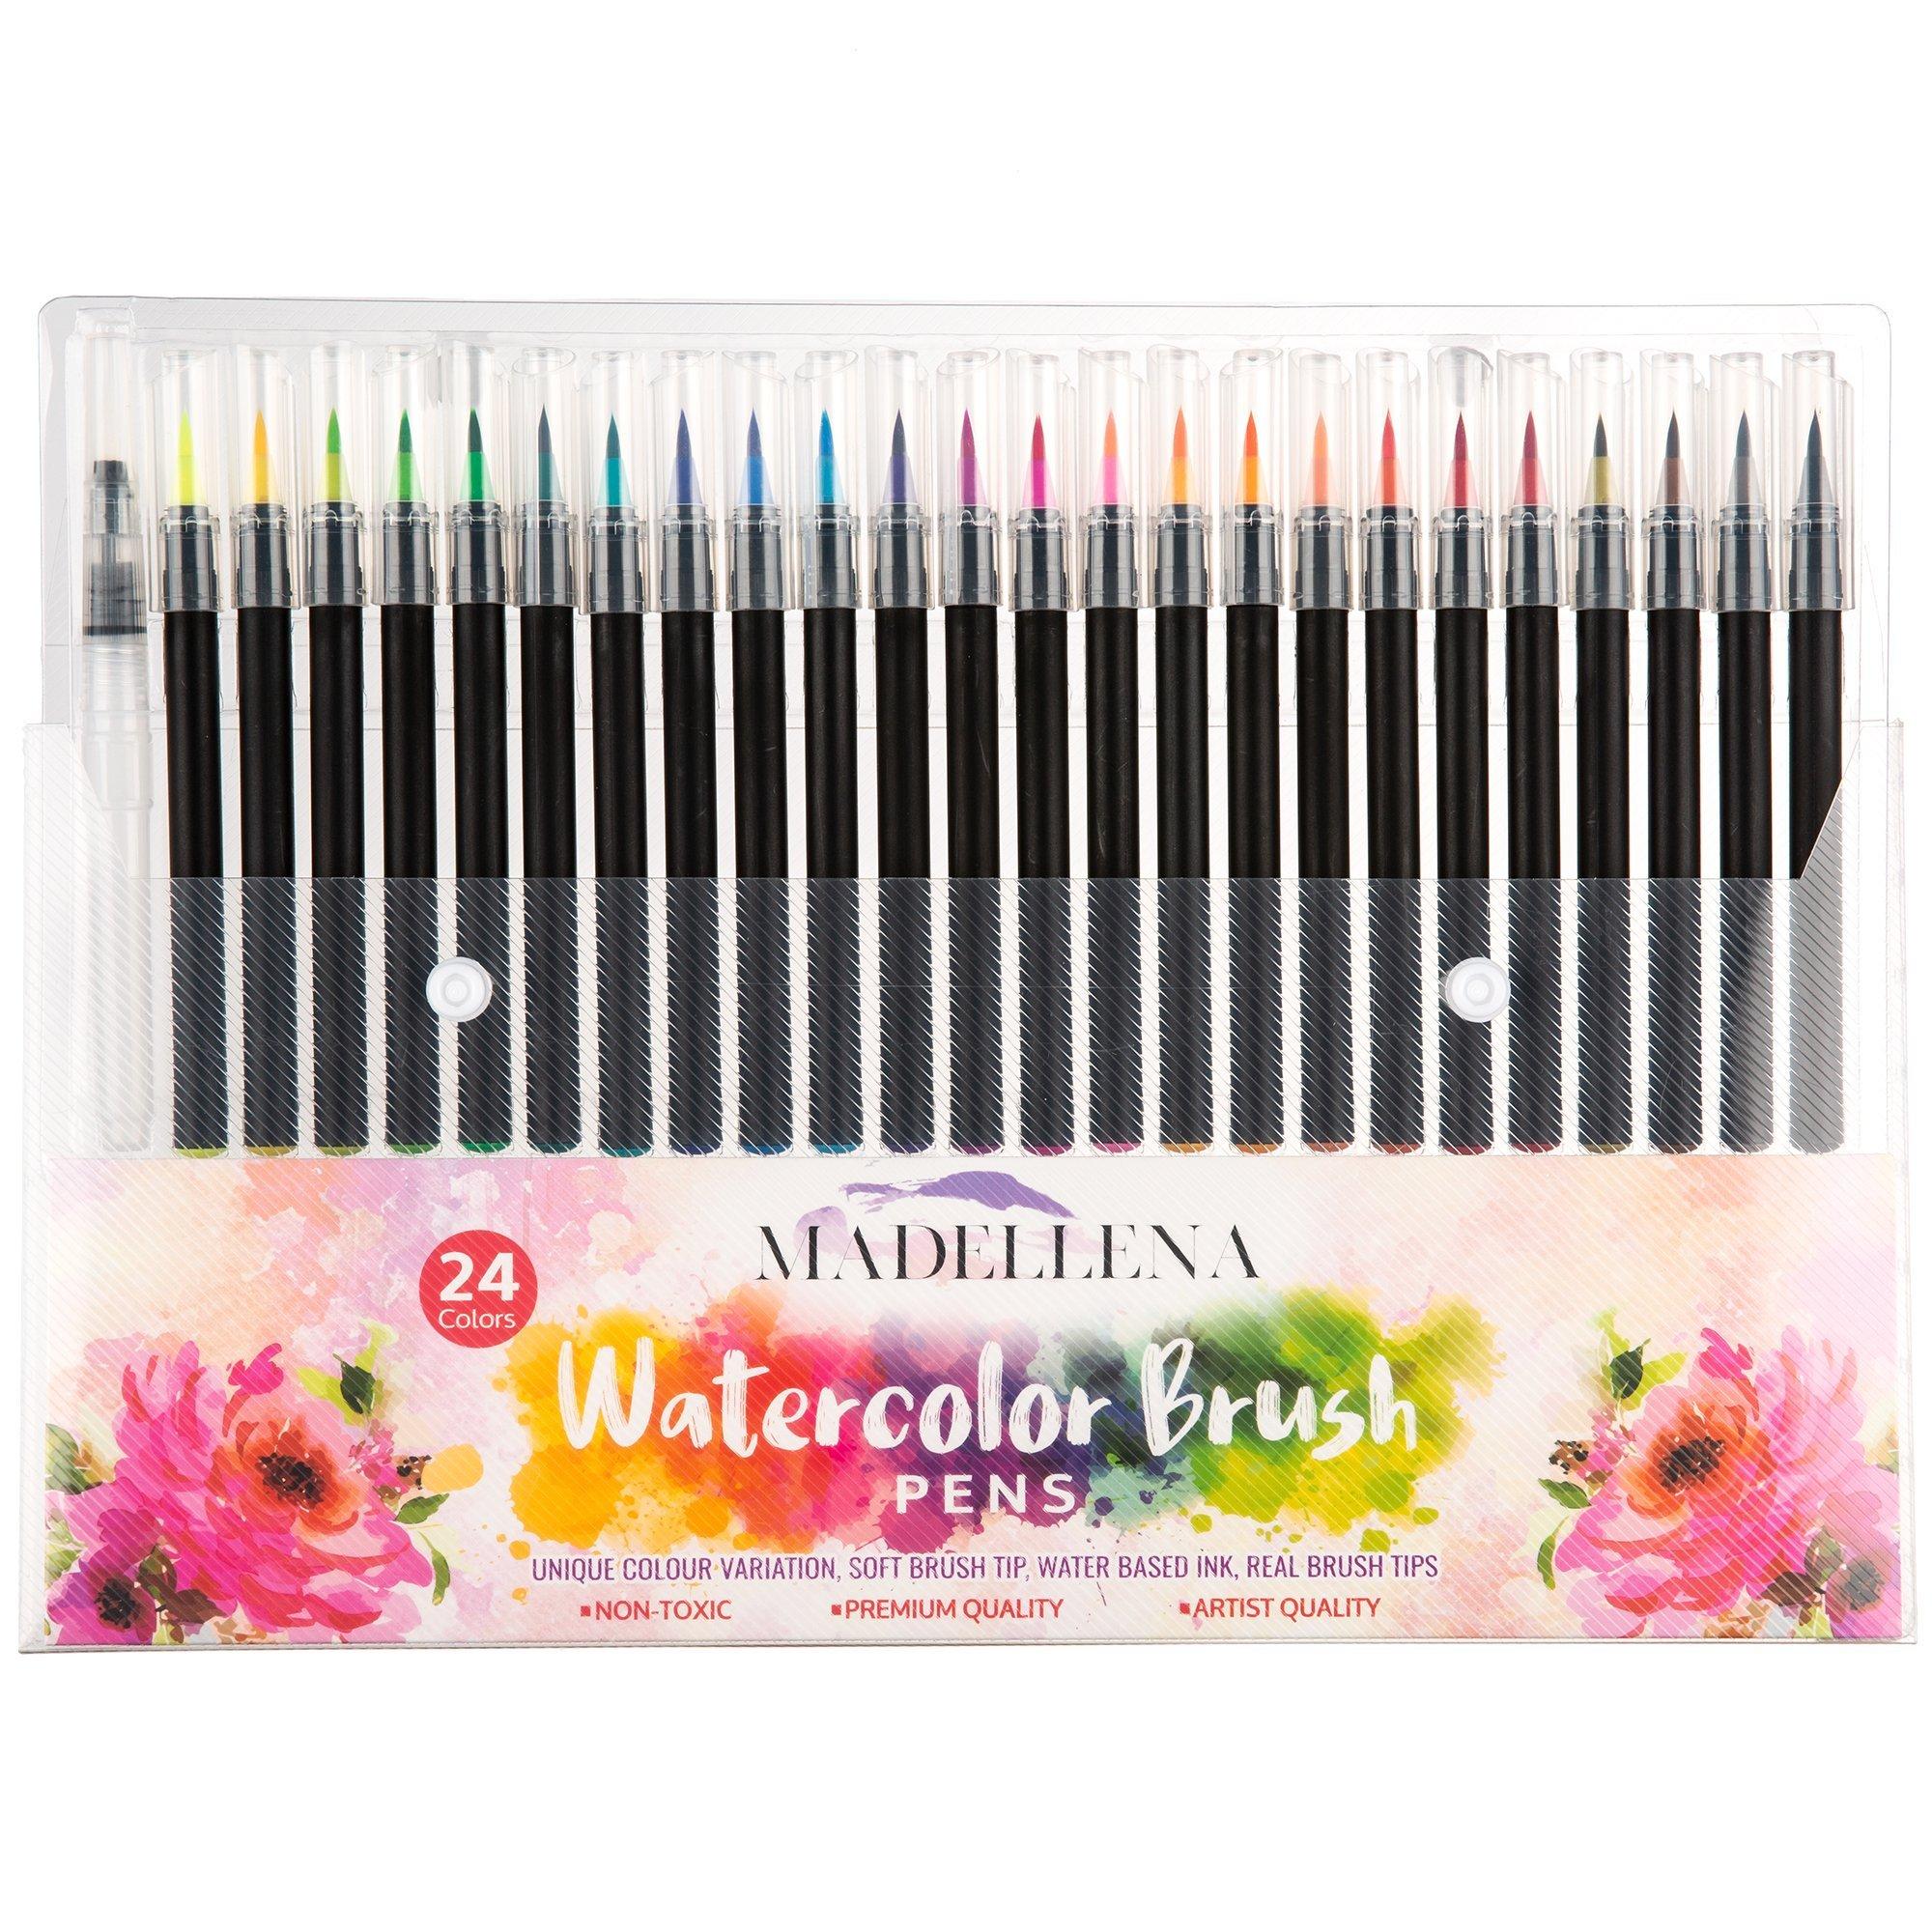 Calligraphy Brush Marker Pens, Watercolor Painting with Flexible Nylon Brush Tips, Blending Markers for Beginners, Water Color Water base Markers, Bible Journaling, Water Brush Pens